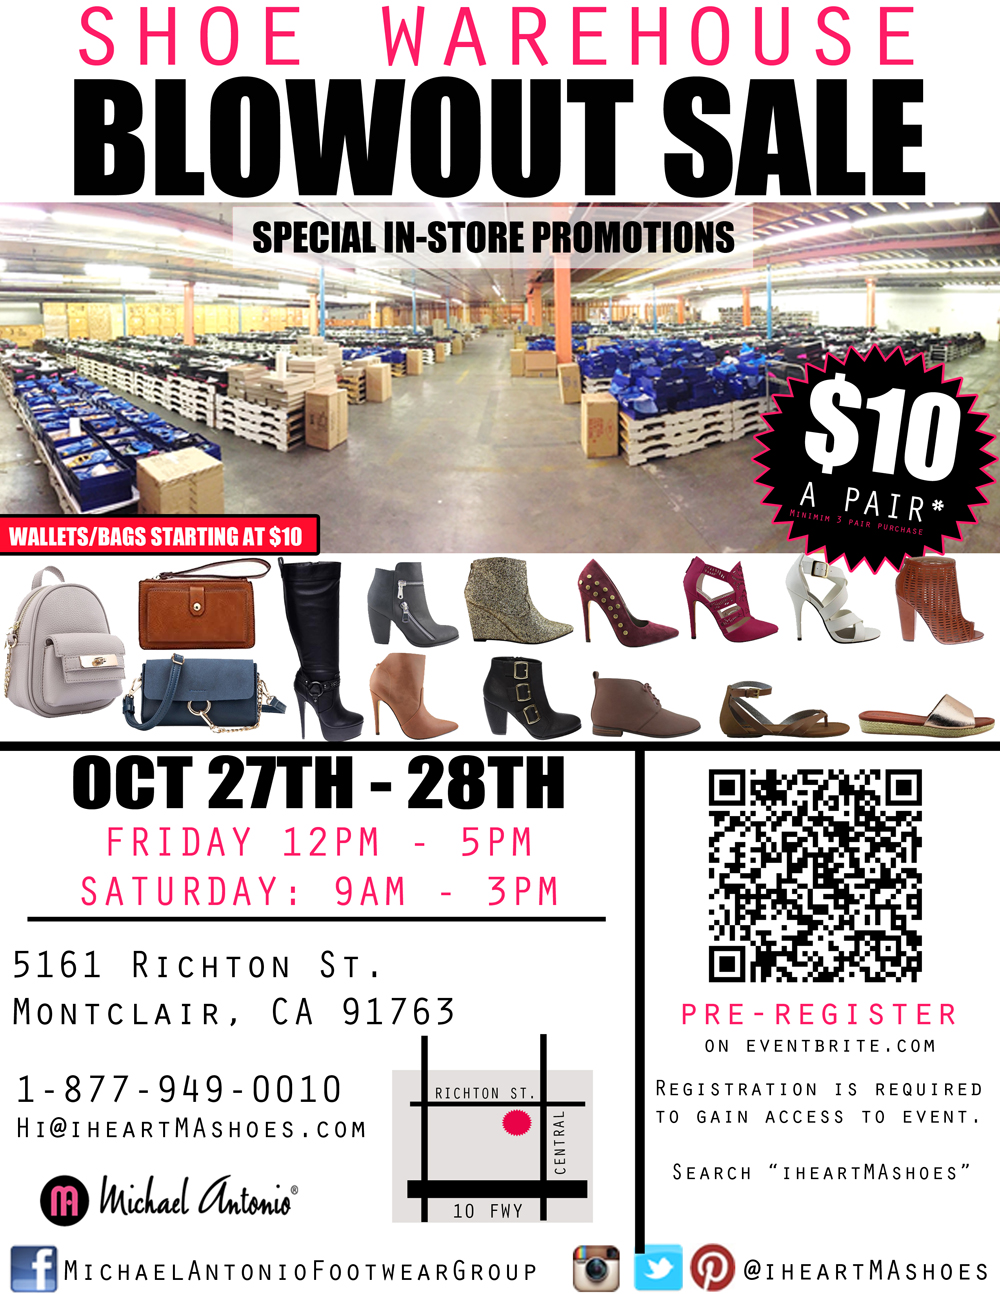 Michael Antonio Iheartmashoes Women Shoes Warehouse